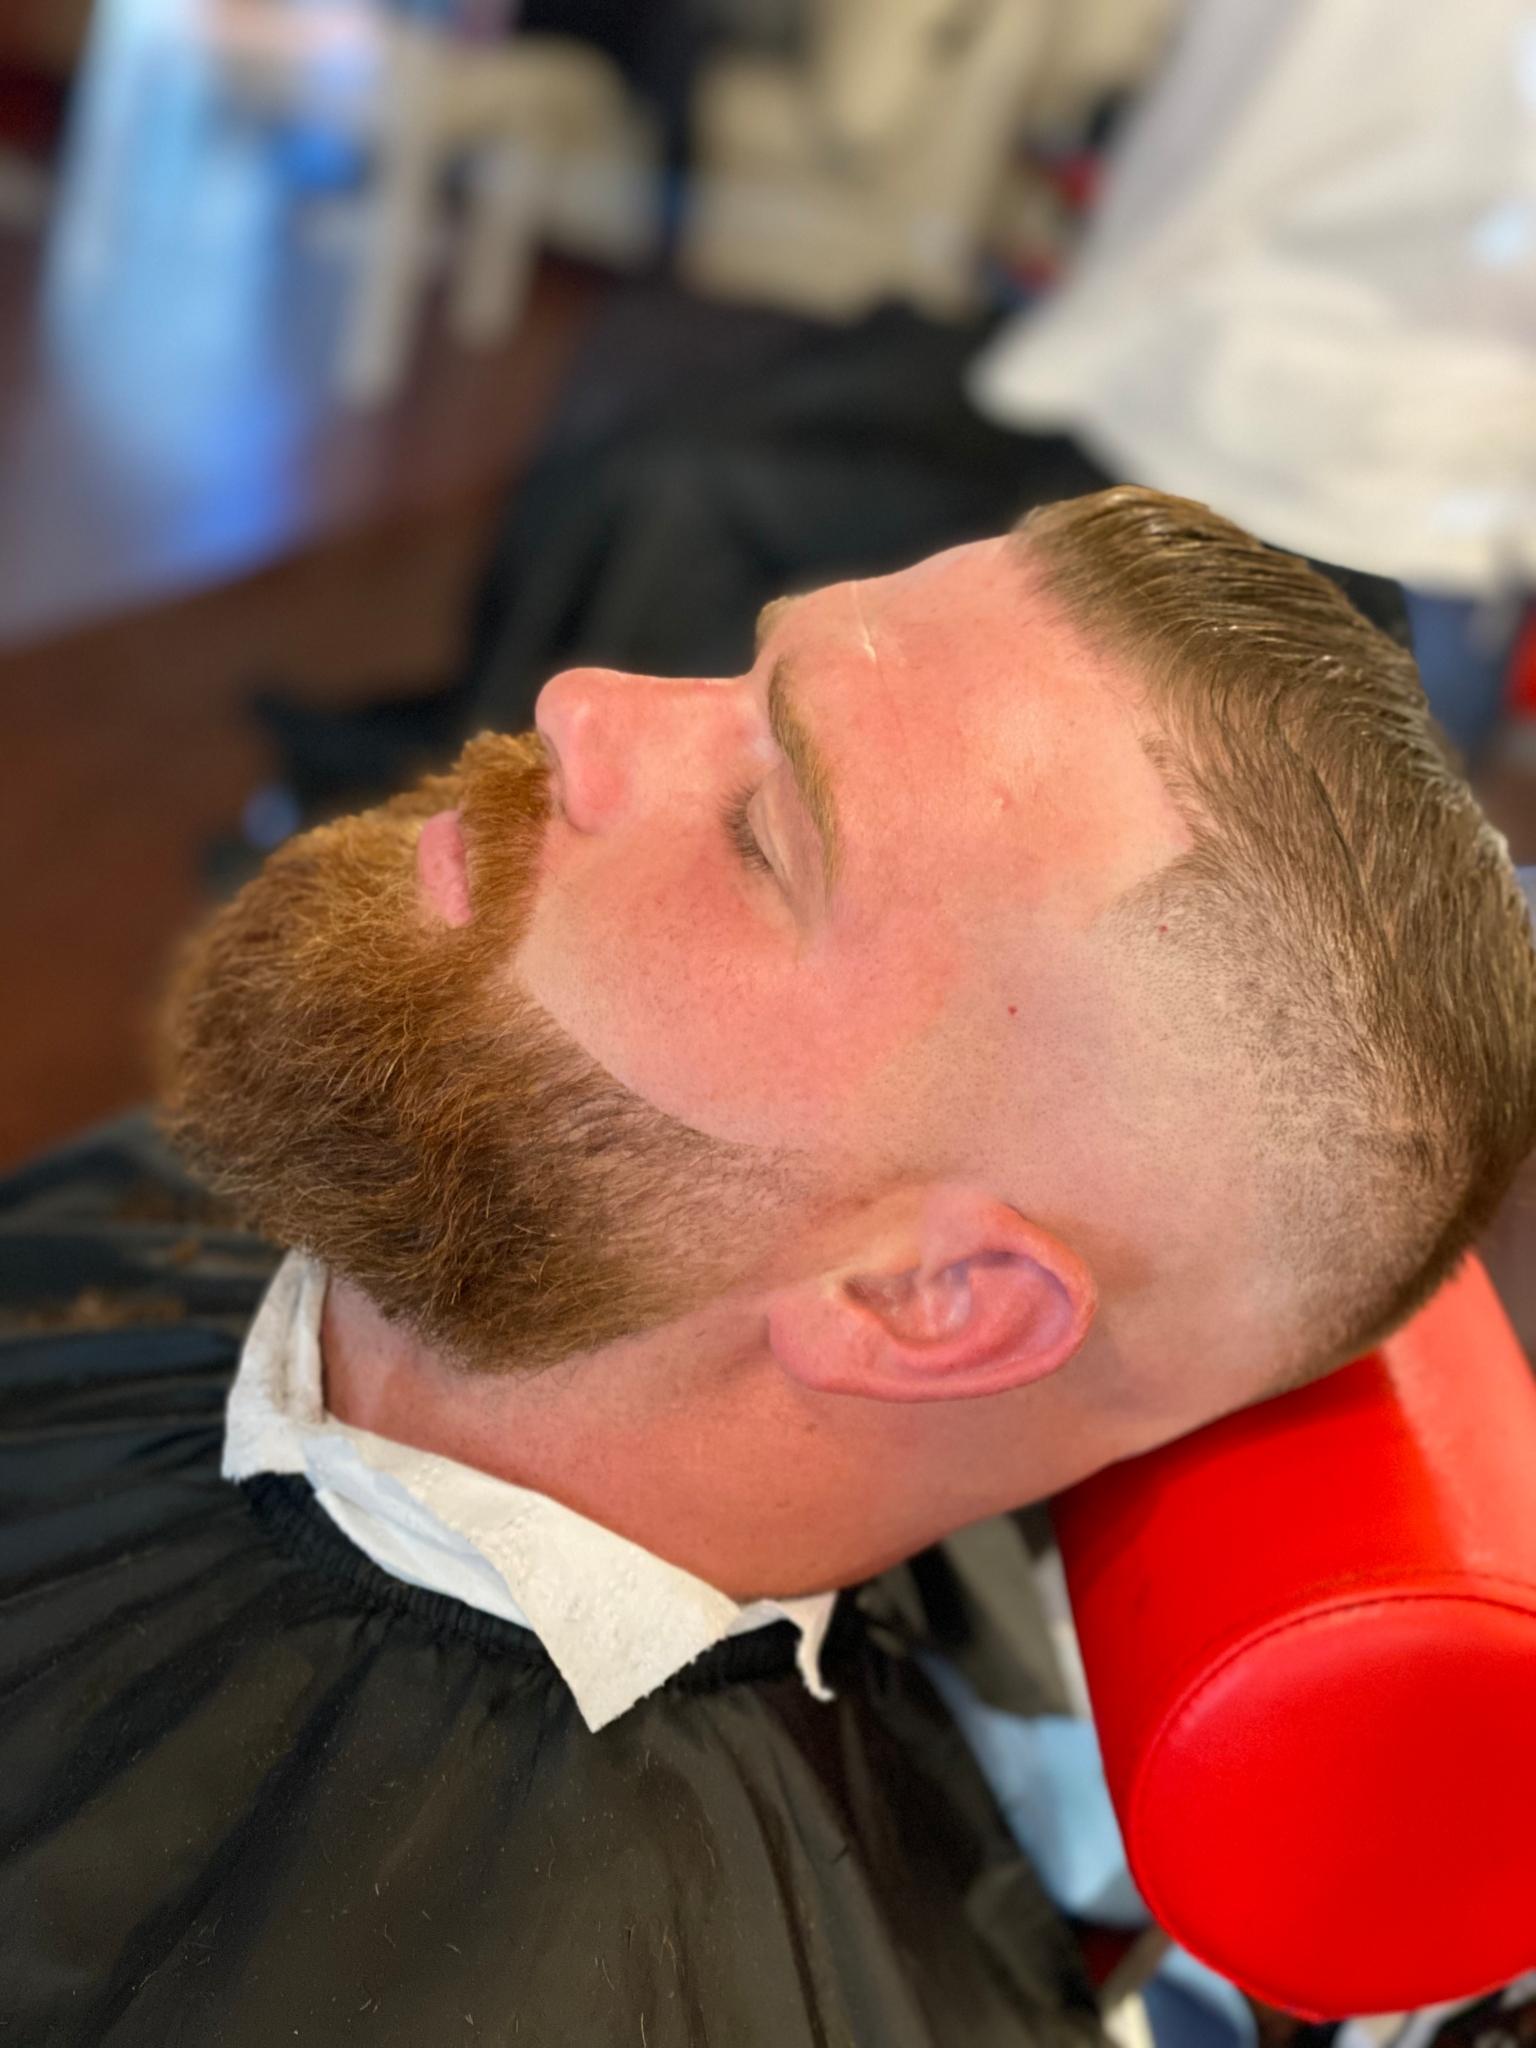 Salon De Barbier Bill K 18 Rue Le Moyne O Longueuil Qc